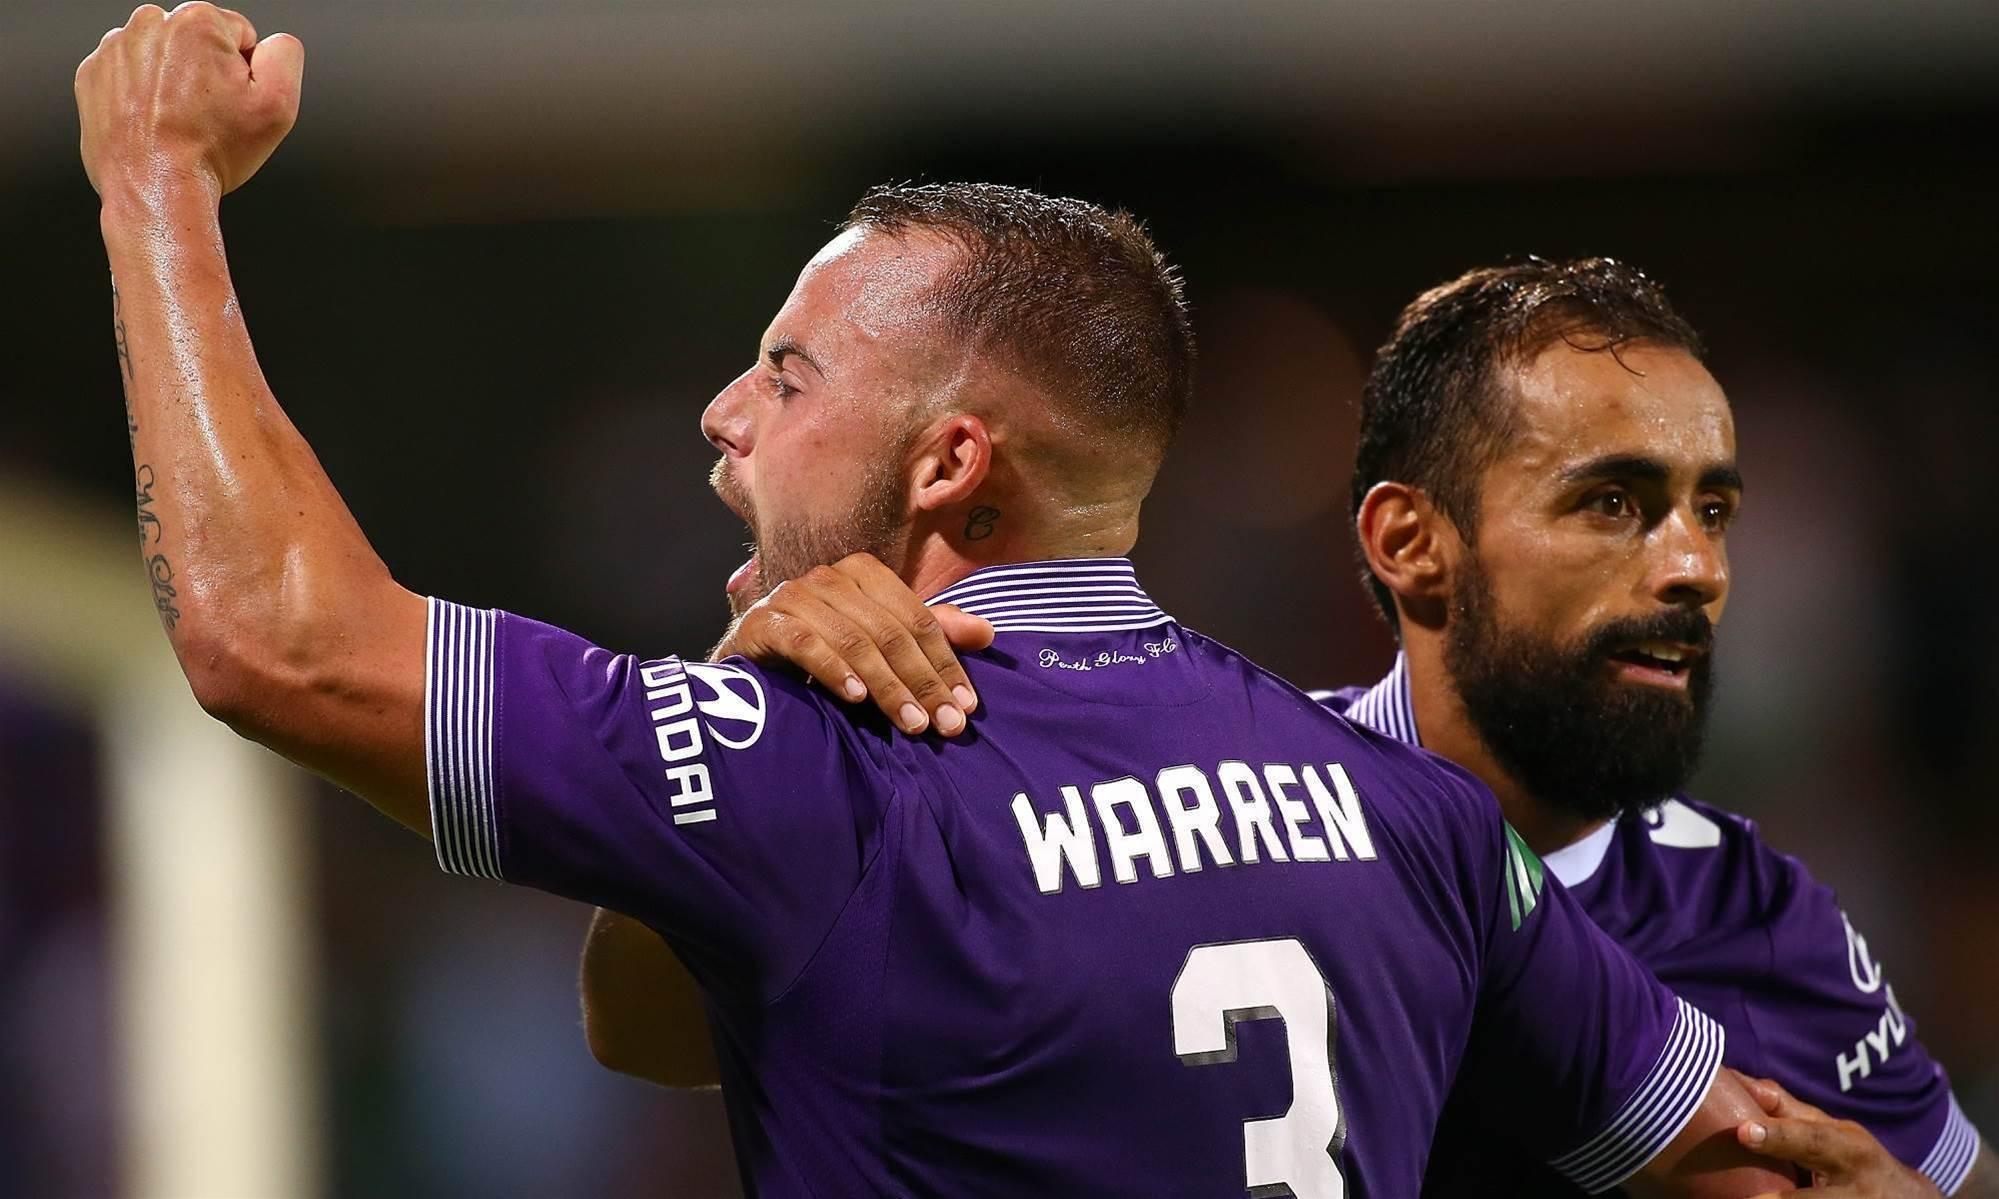 Warren pens new Glory deal